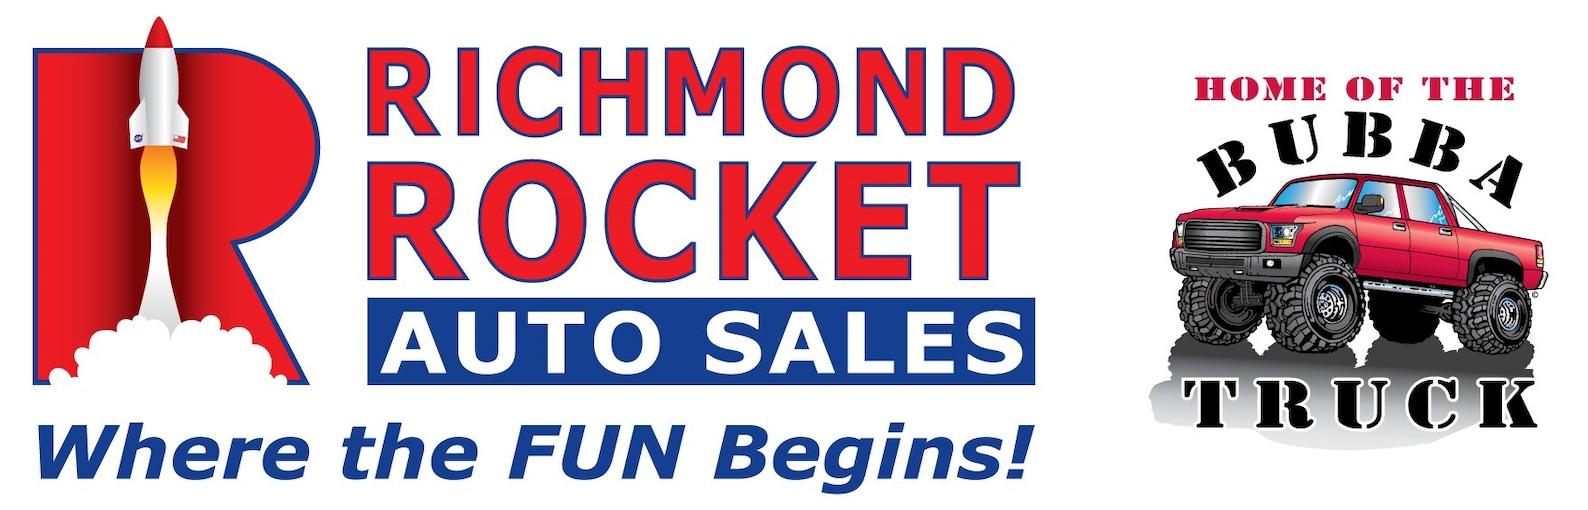 Richmond Rocket Auto Sales